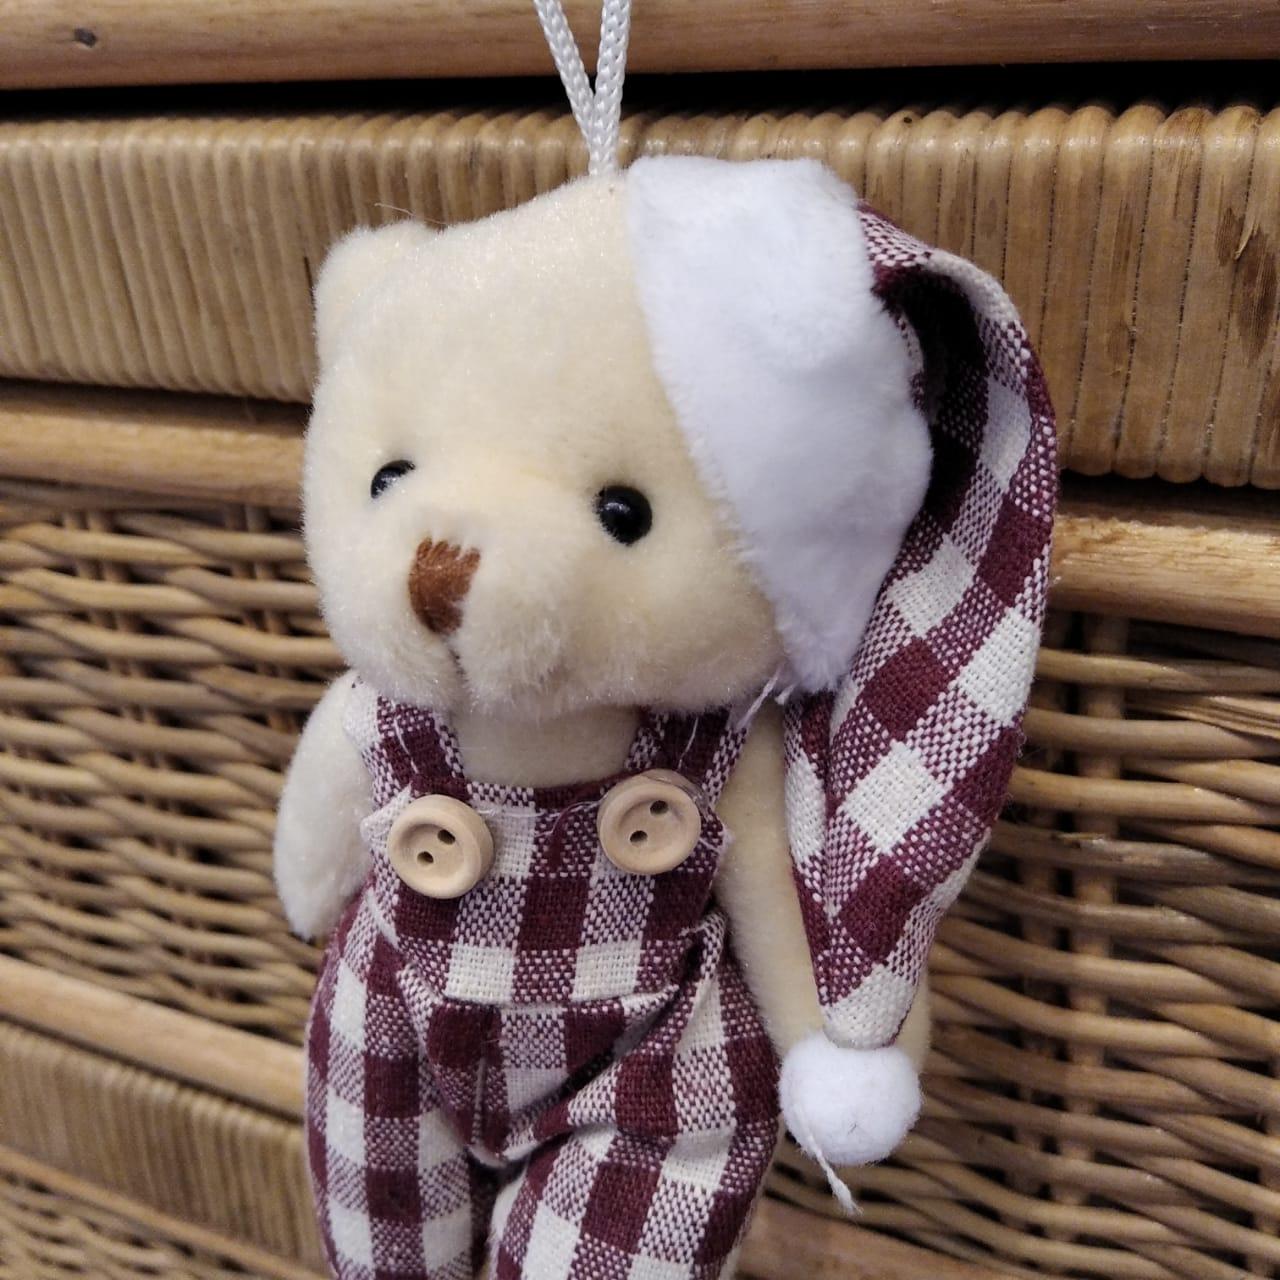 Pendente Natalino Urso Pelúcia Enfeite Urso Natal Pendurar  - Lemis